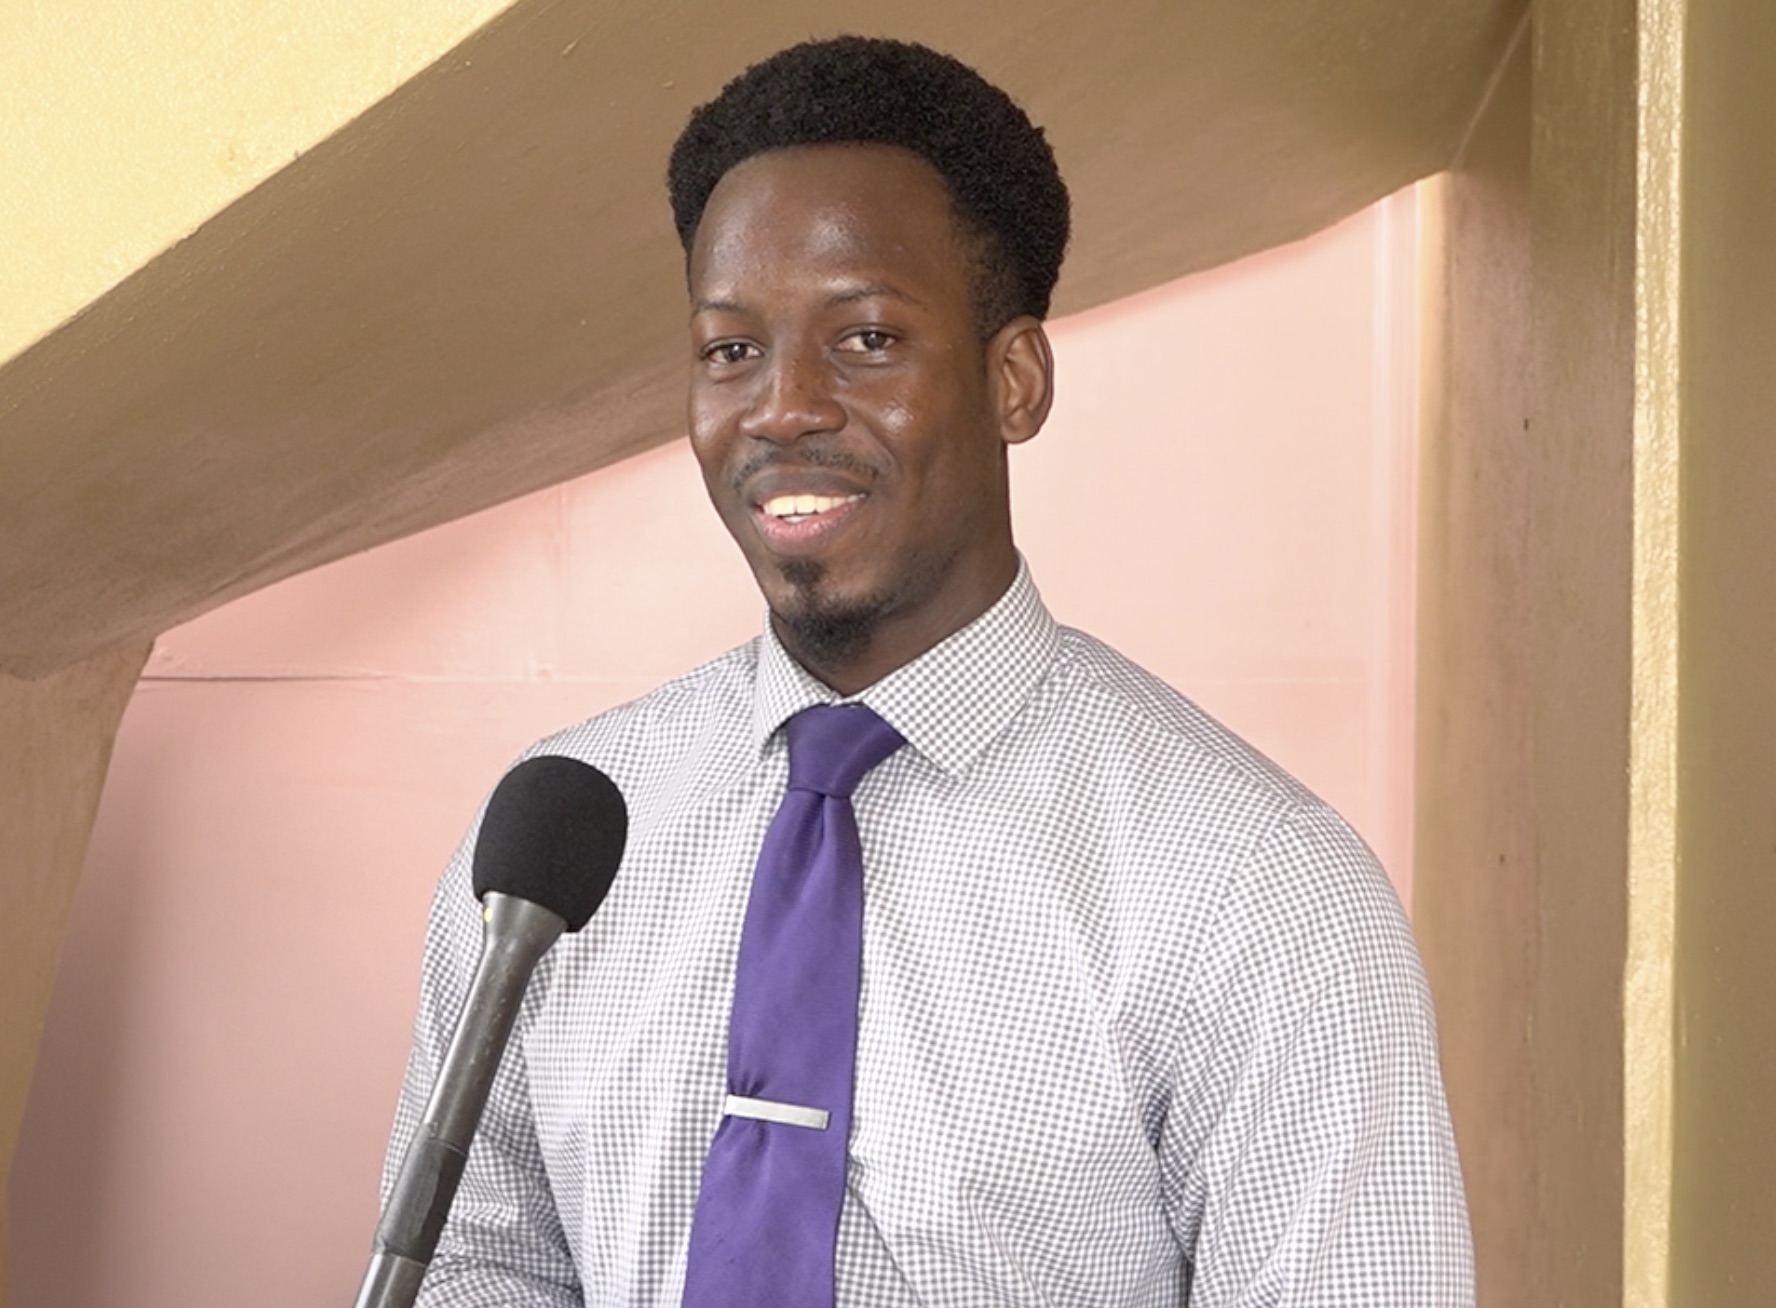 Mr. Mario Phillip, Gender Affairs Officer in the Department of Gender Affairs Gender Affairs